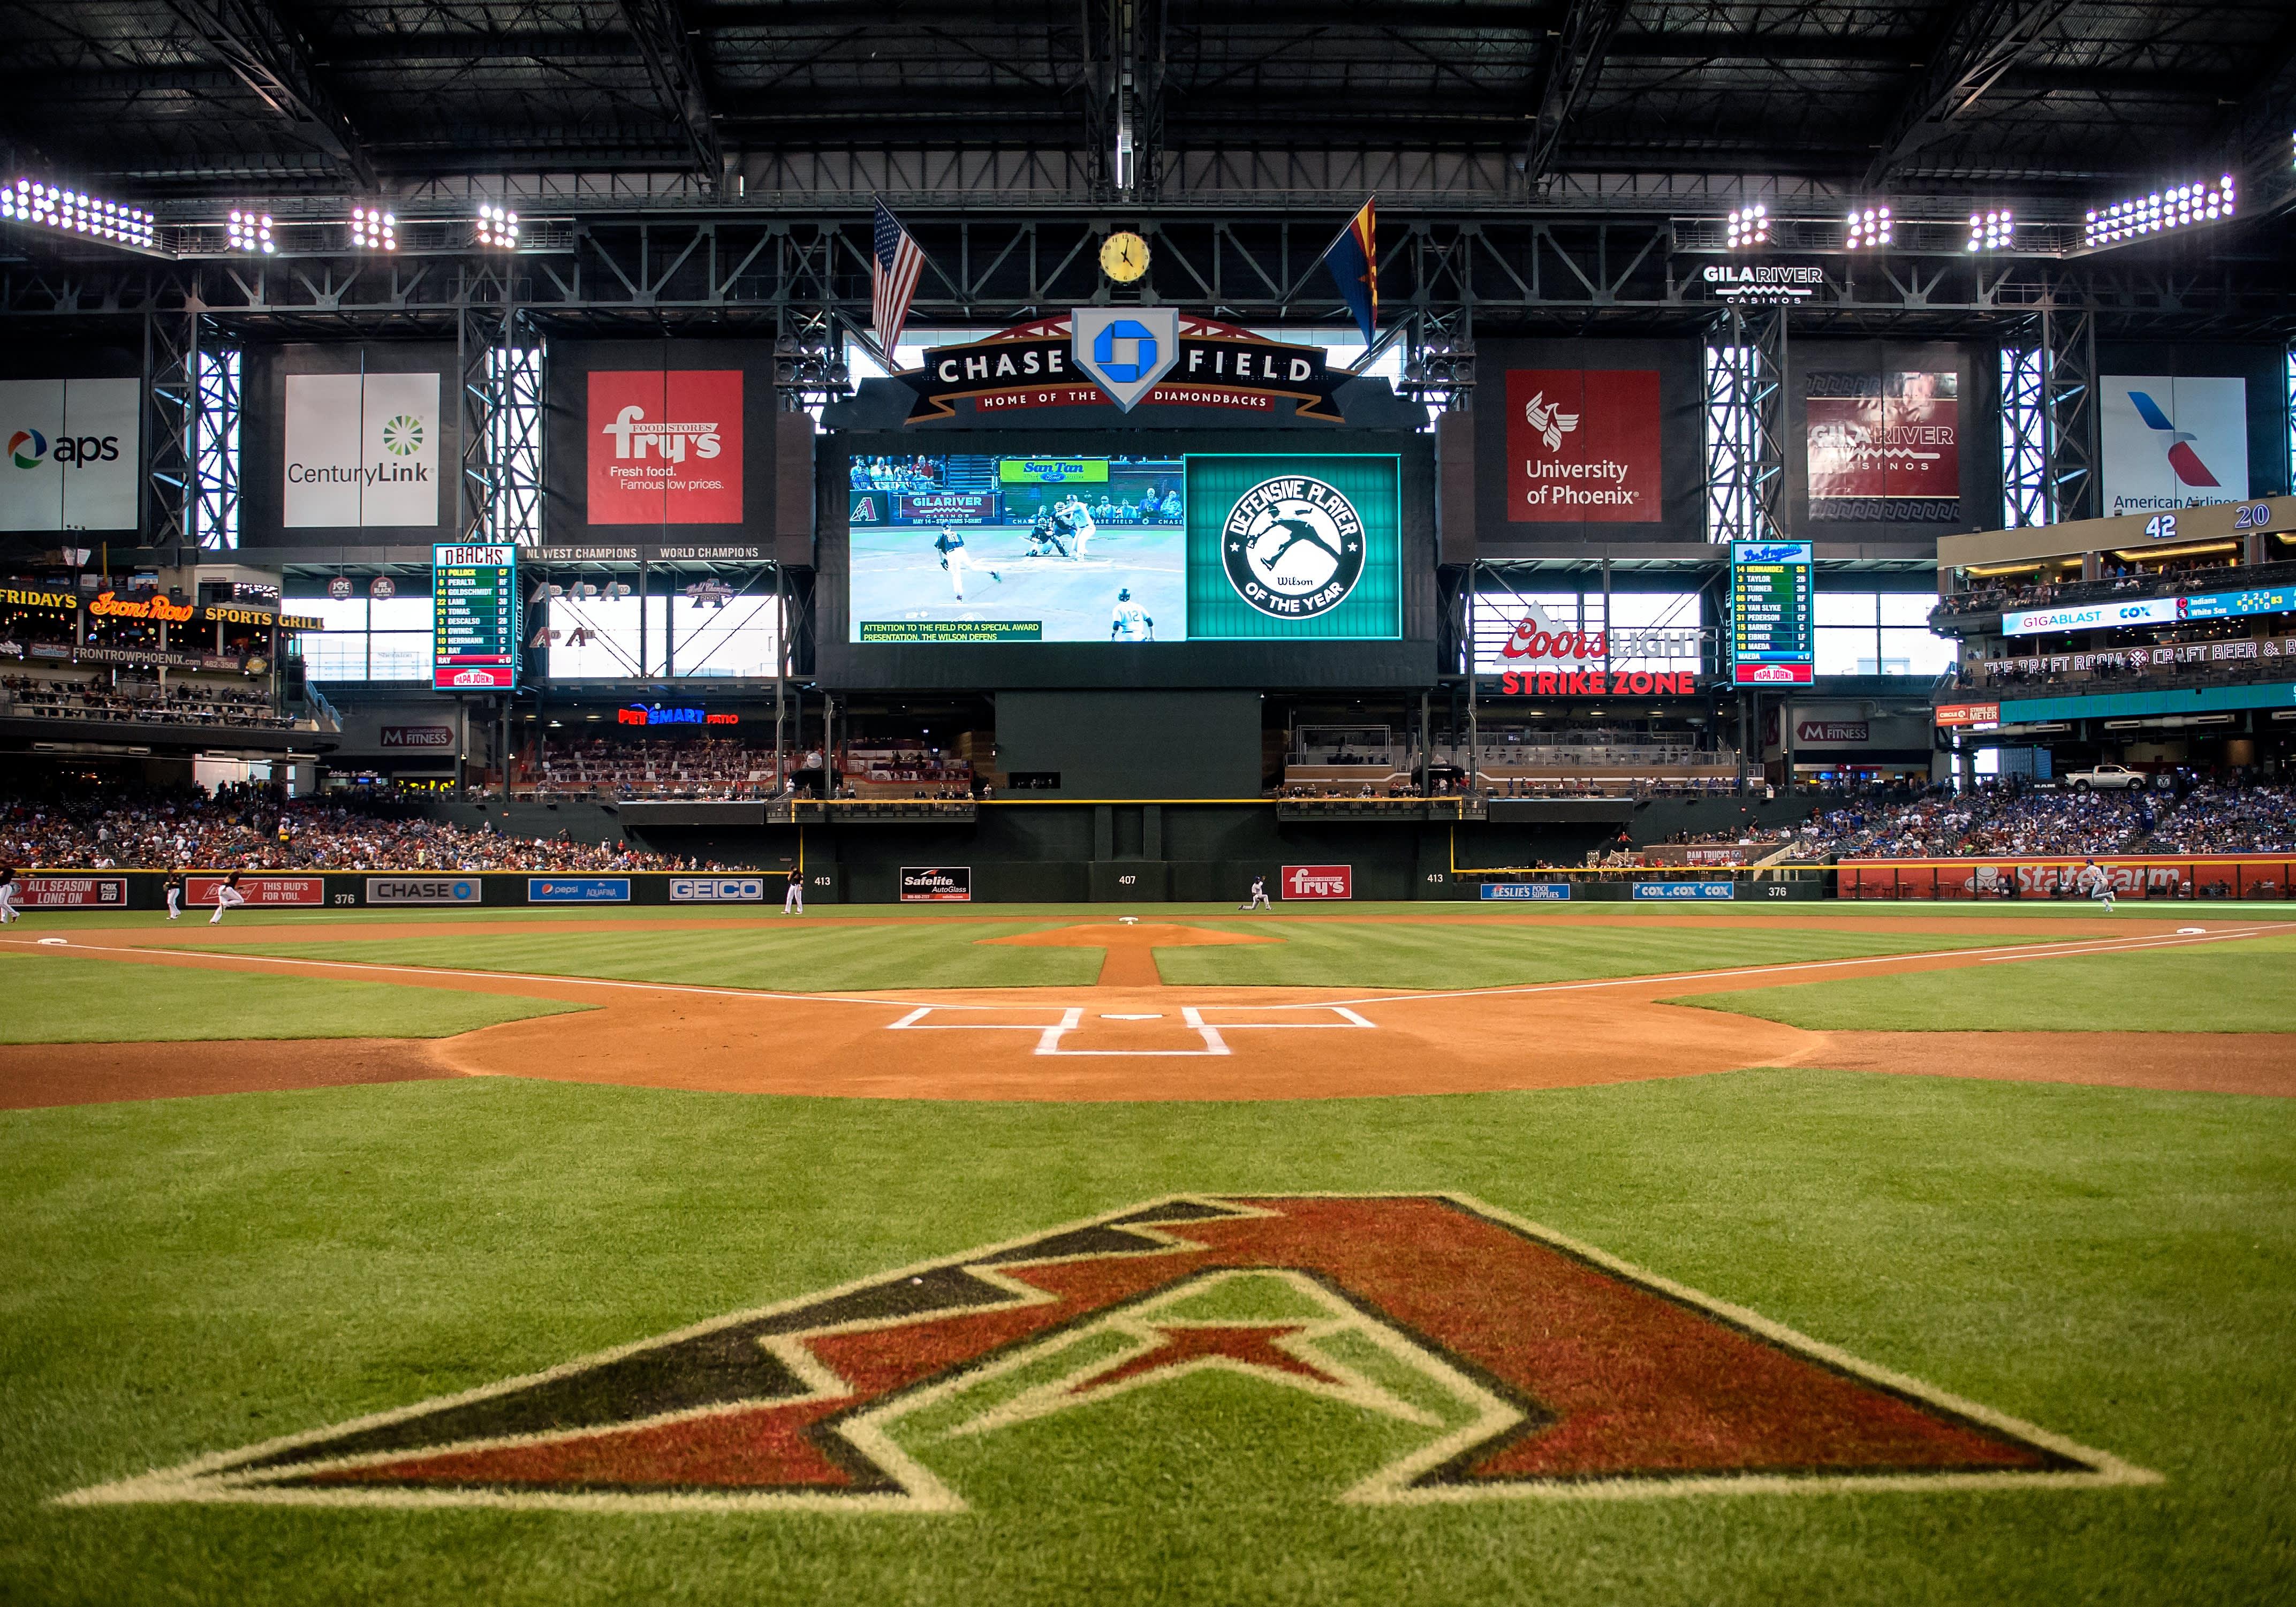 Coronavirus live updates: MLB may play all games in Arizona to resume season, USNS Comfort crewmember tests positive - CNBC 3